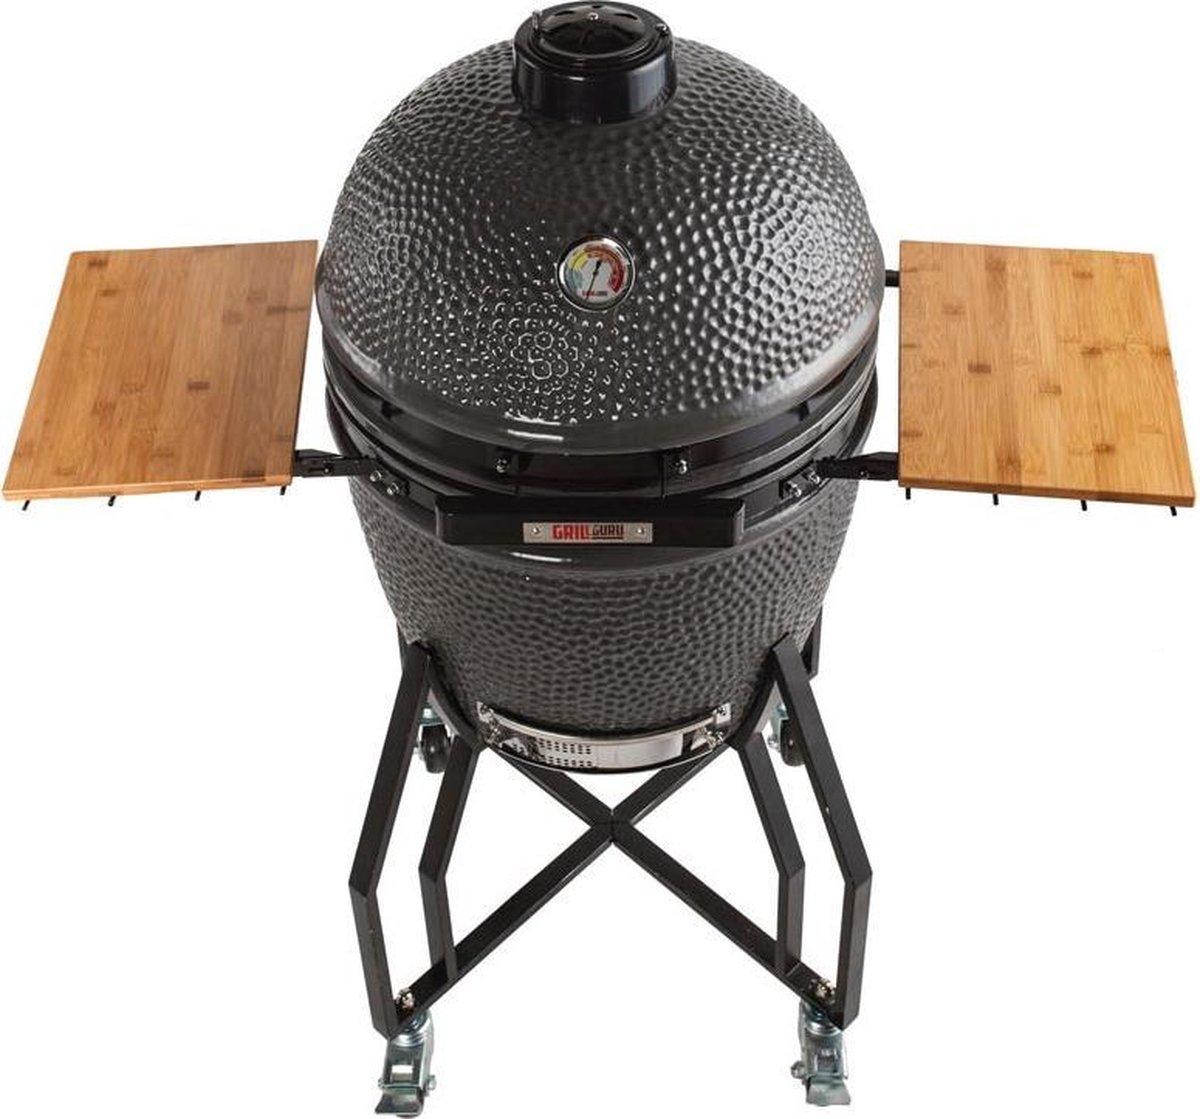 Grill Guru Classic Kamado Houtskool Barbecue - Grilloppervlak Ø 46 cm - Keramiek - Grijs